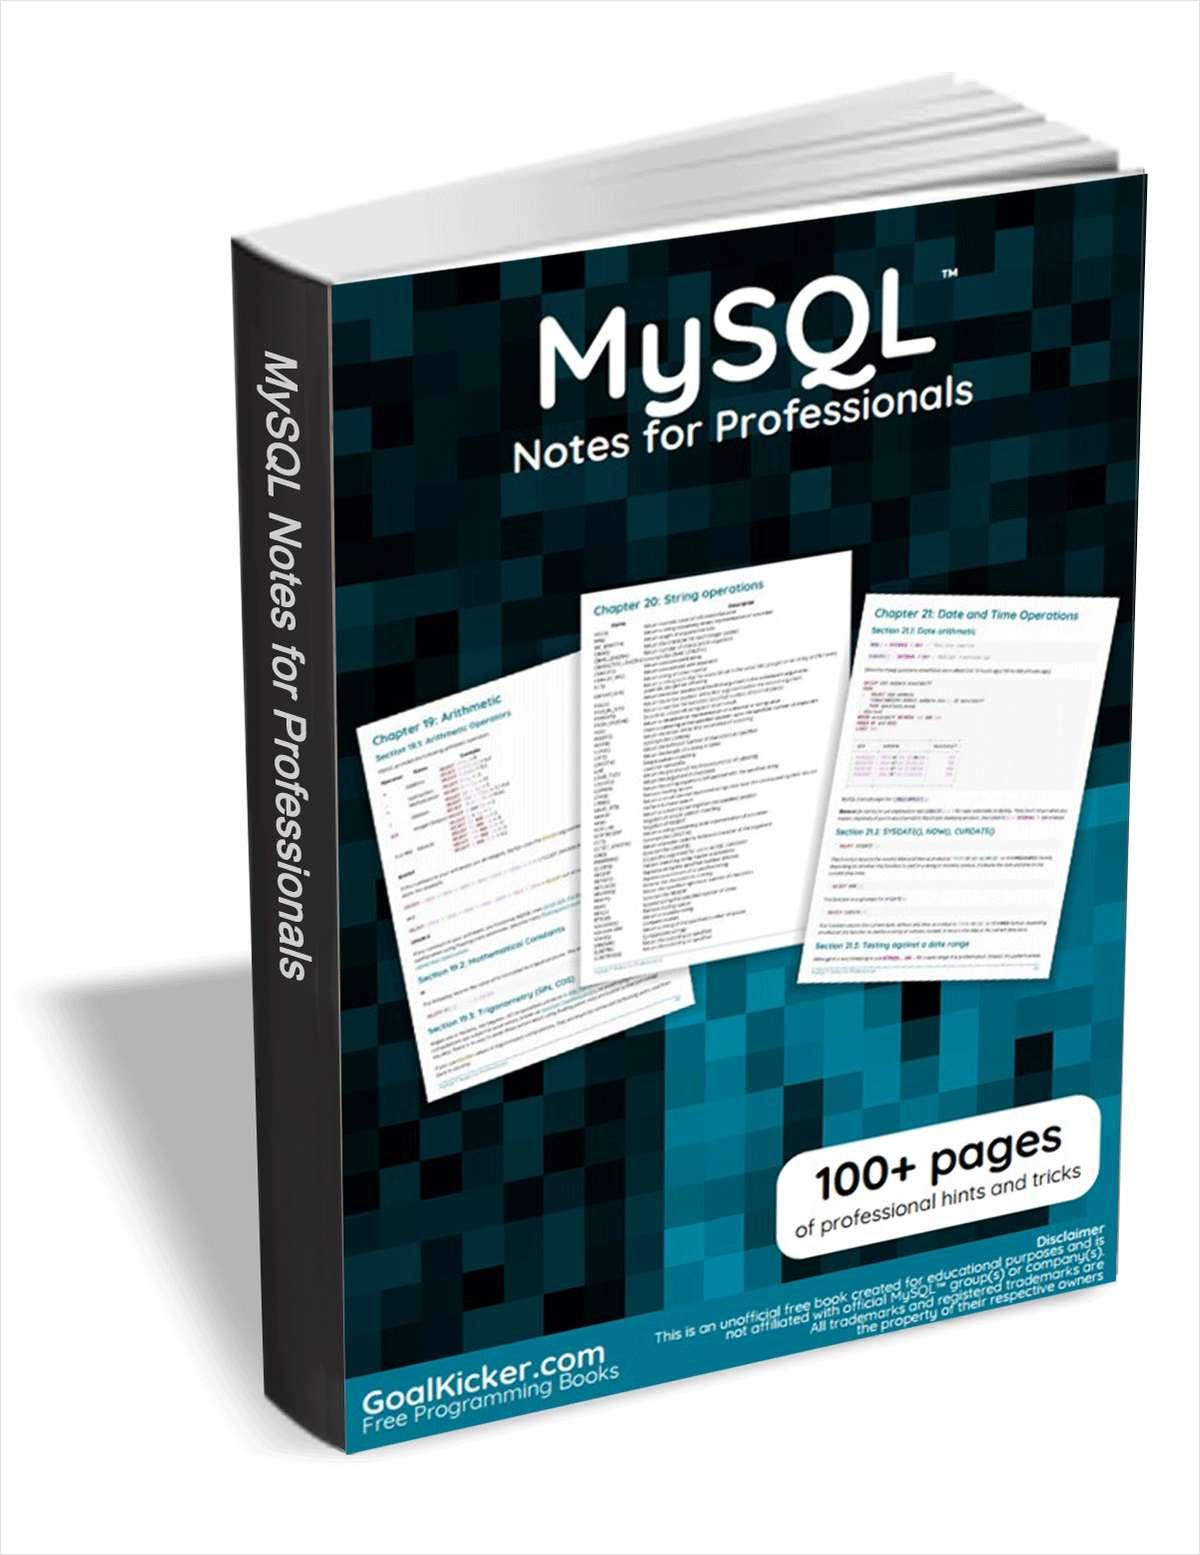 MySQL Notes for Professionals